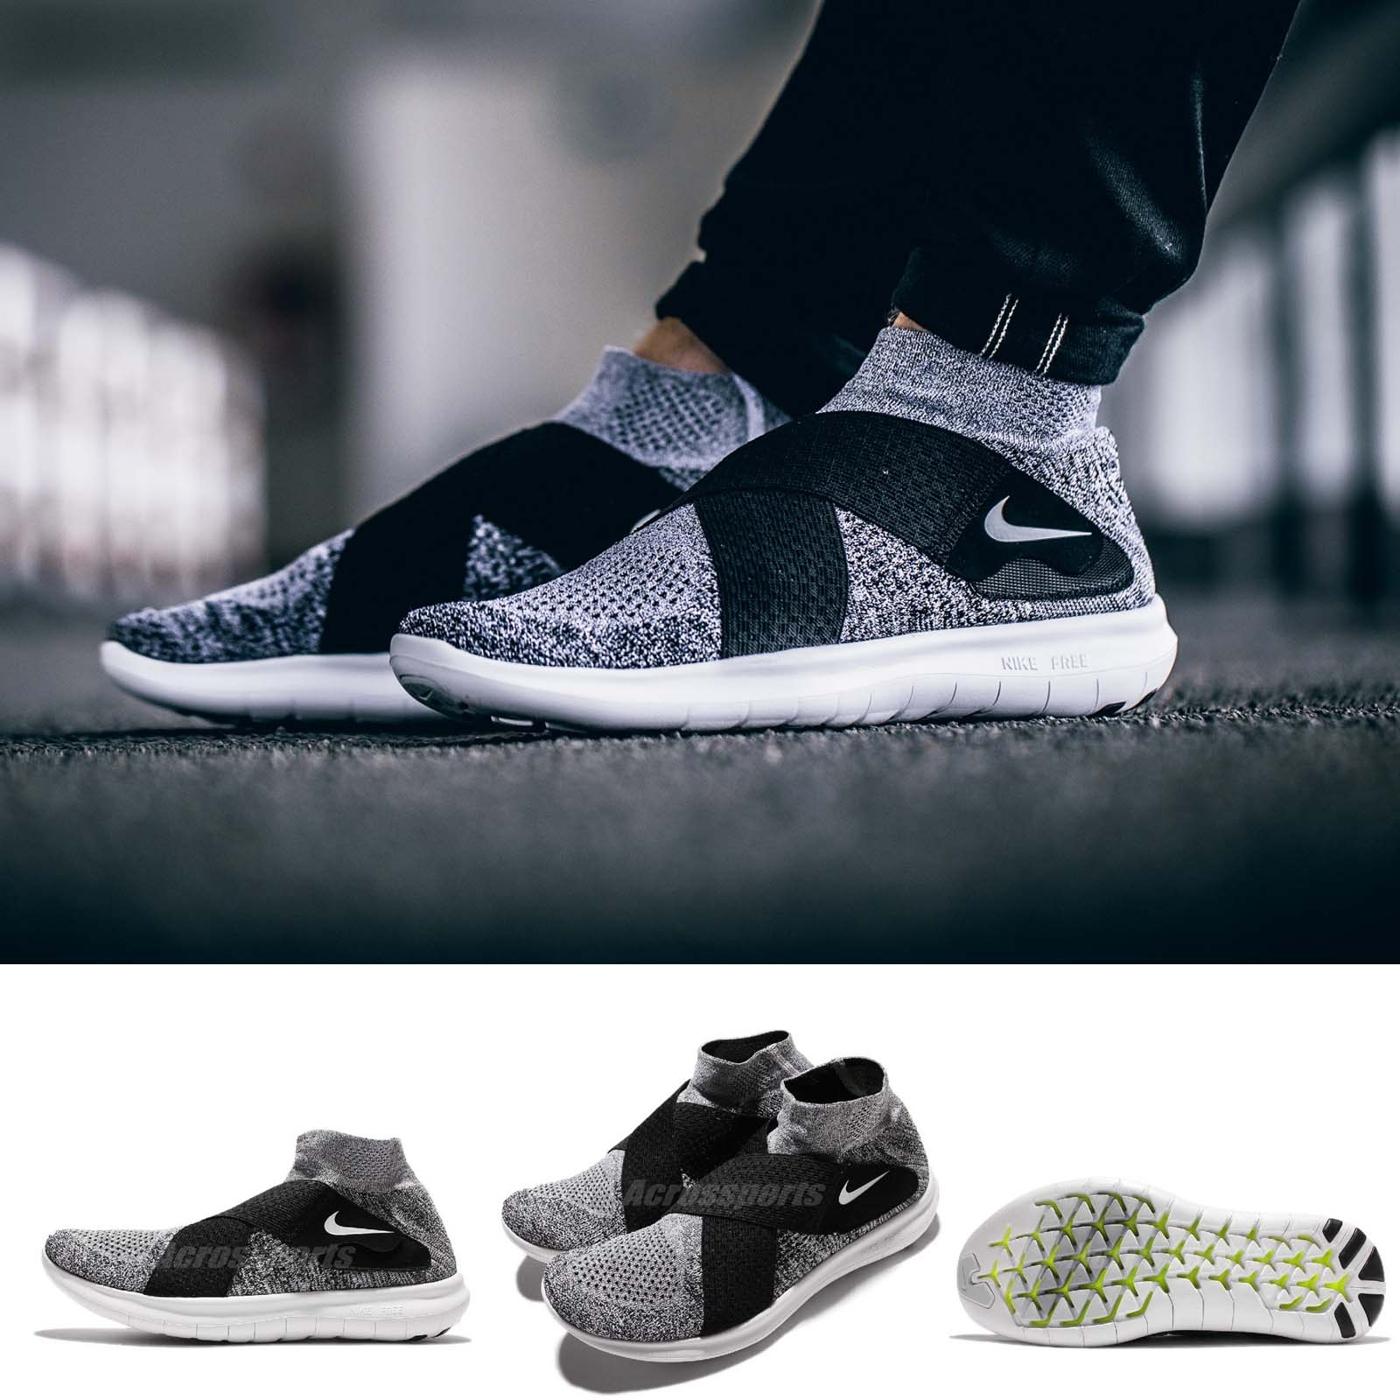 Nike慢跑鞋Free RN Motion FK 2017黑灰雪花交叉綁帶赤足運動鞋男鞋PUMP306 880845-001